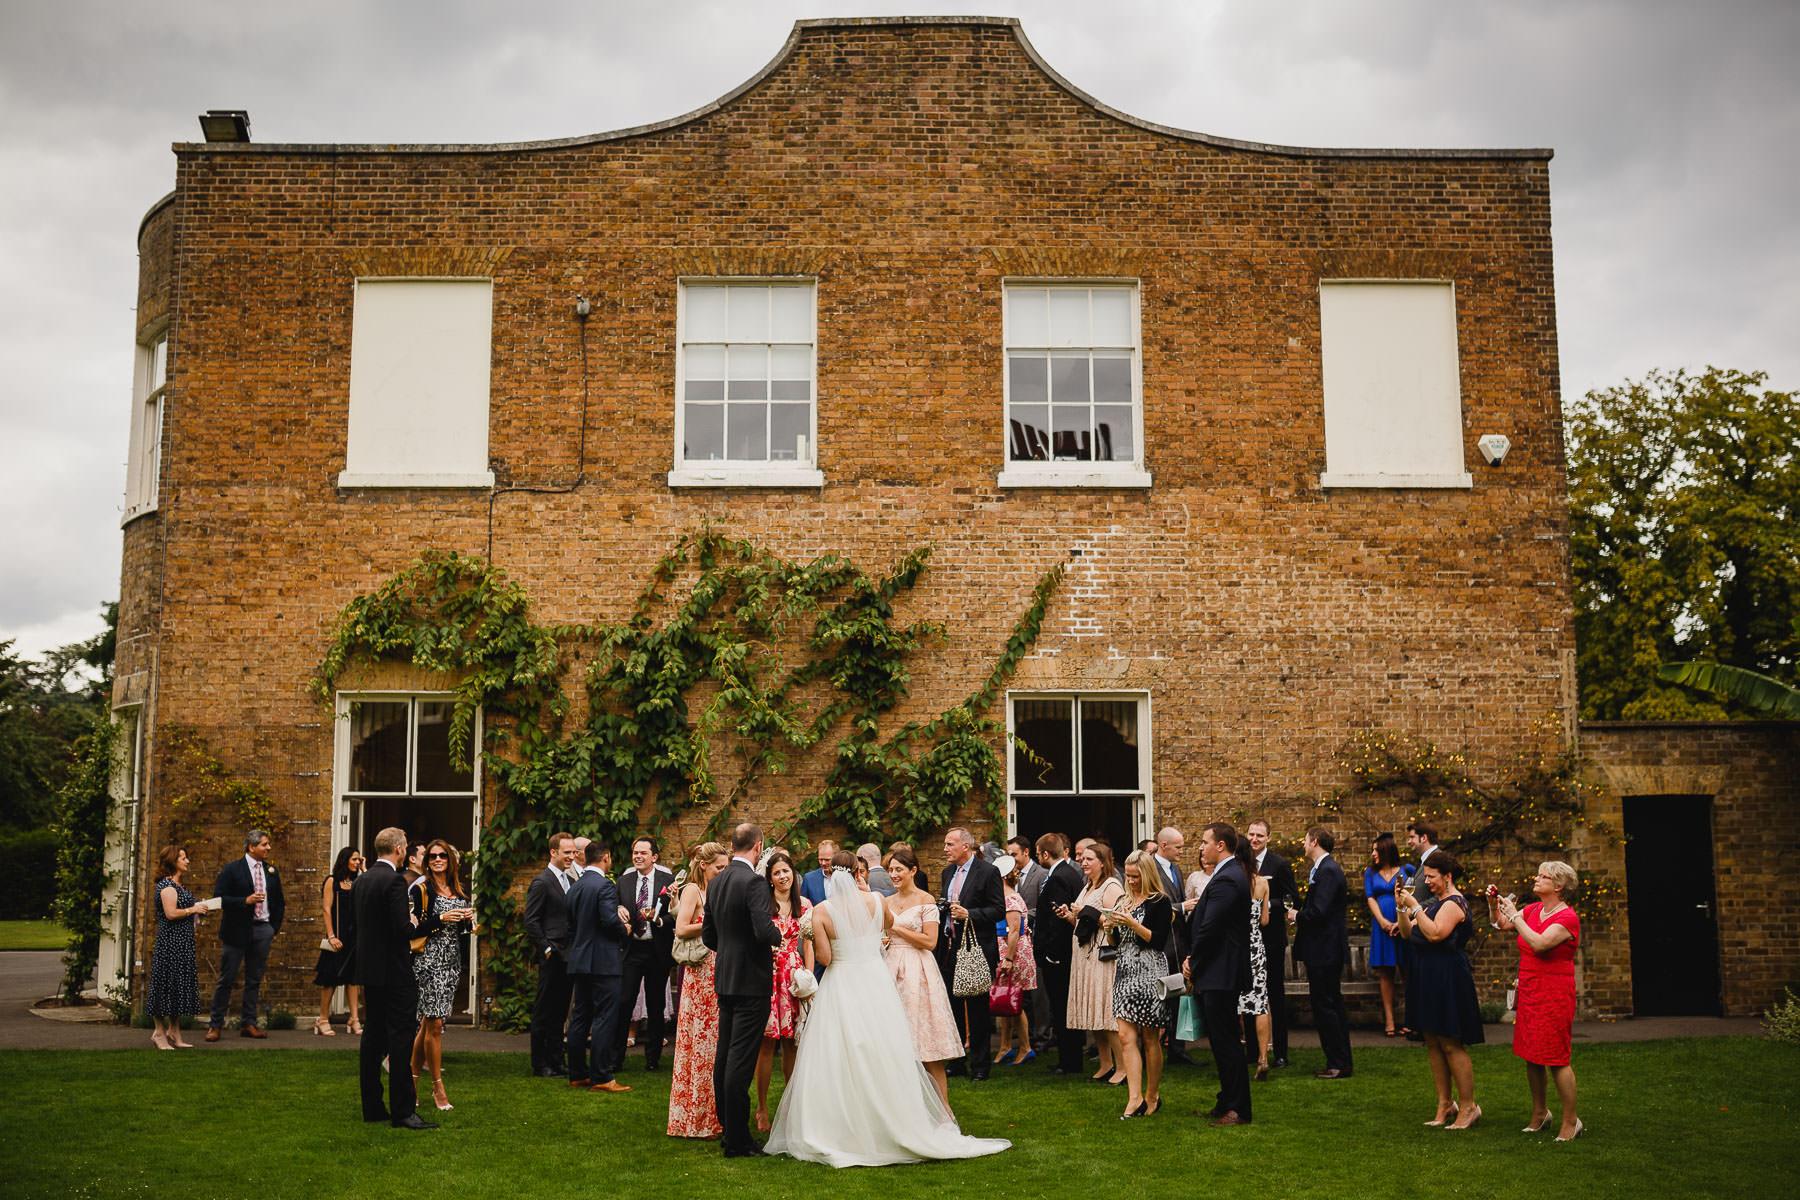 kew gardens wedding photography astra duncan28